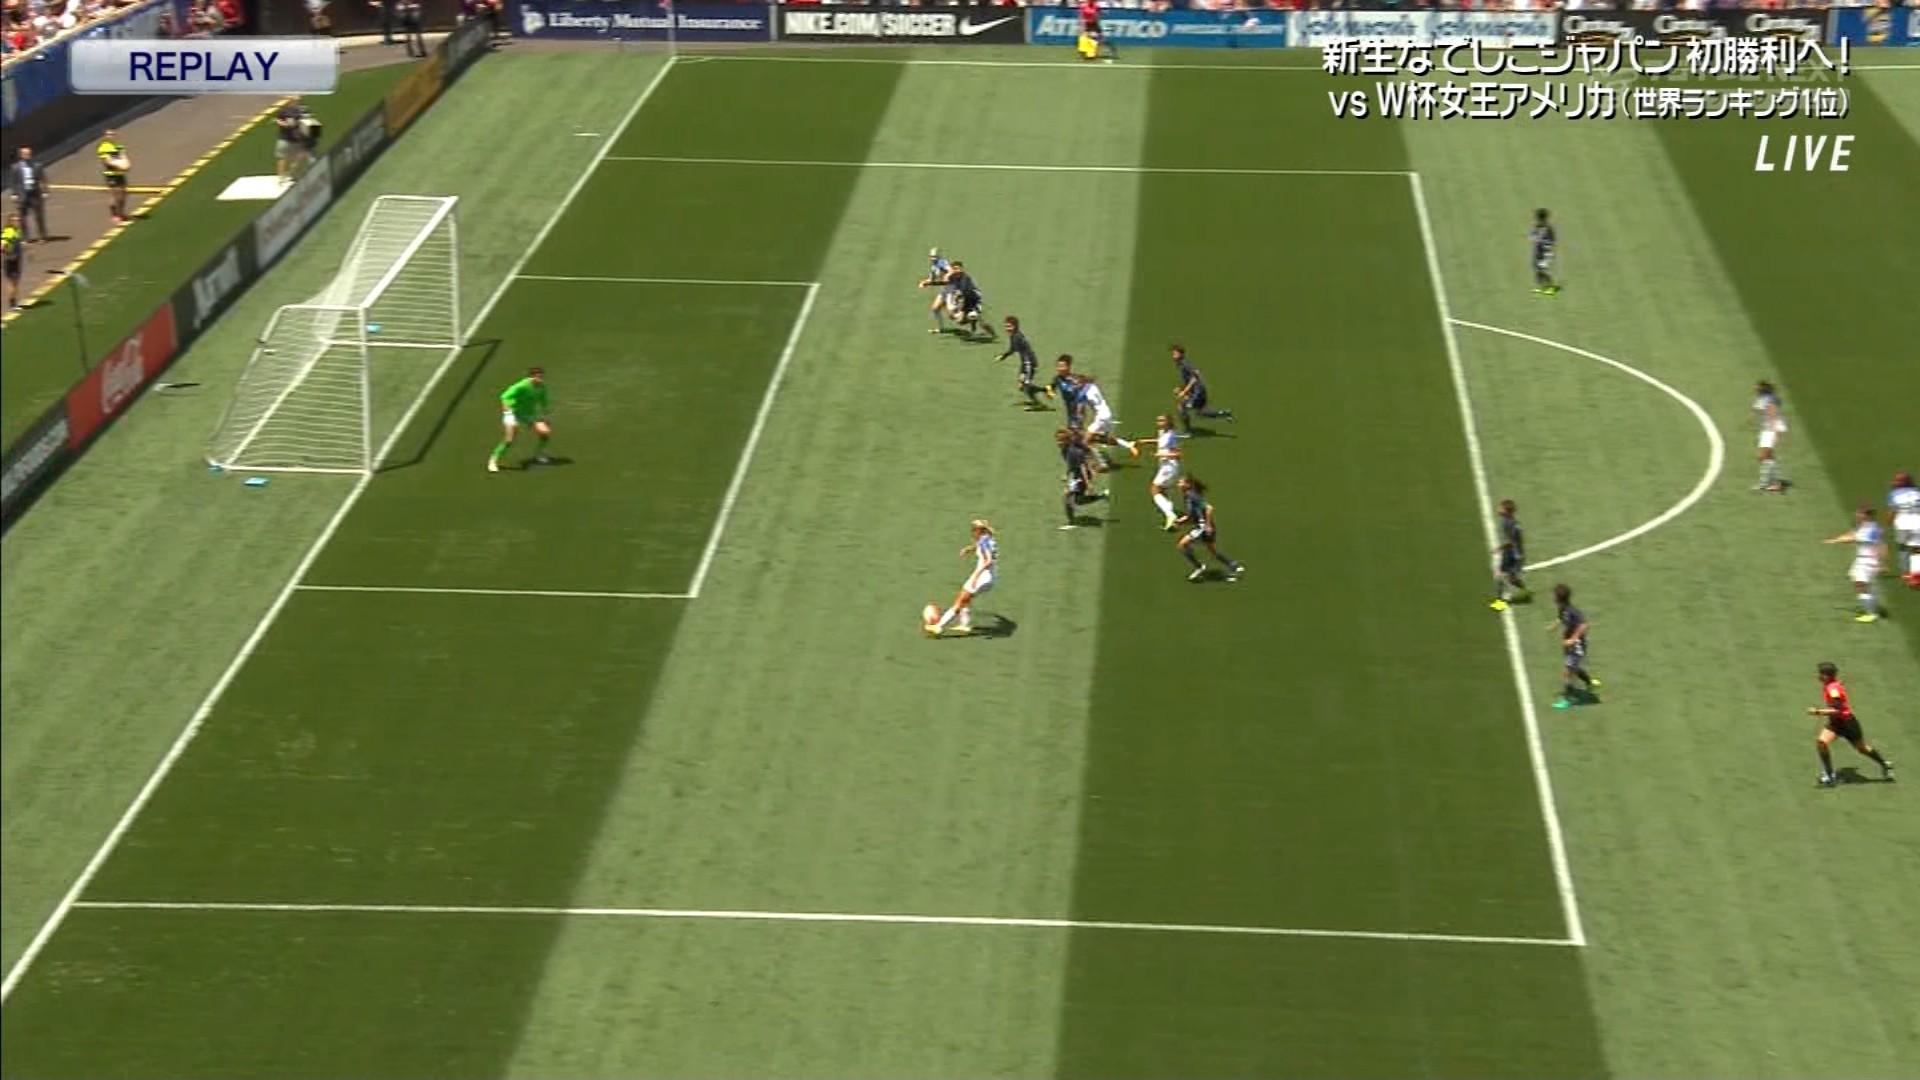 JJ was offside on the goal